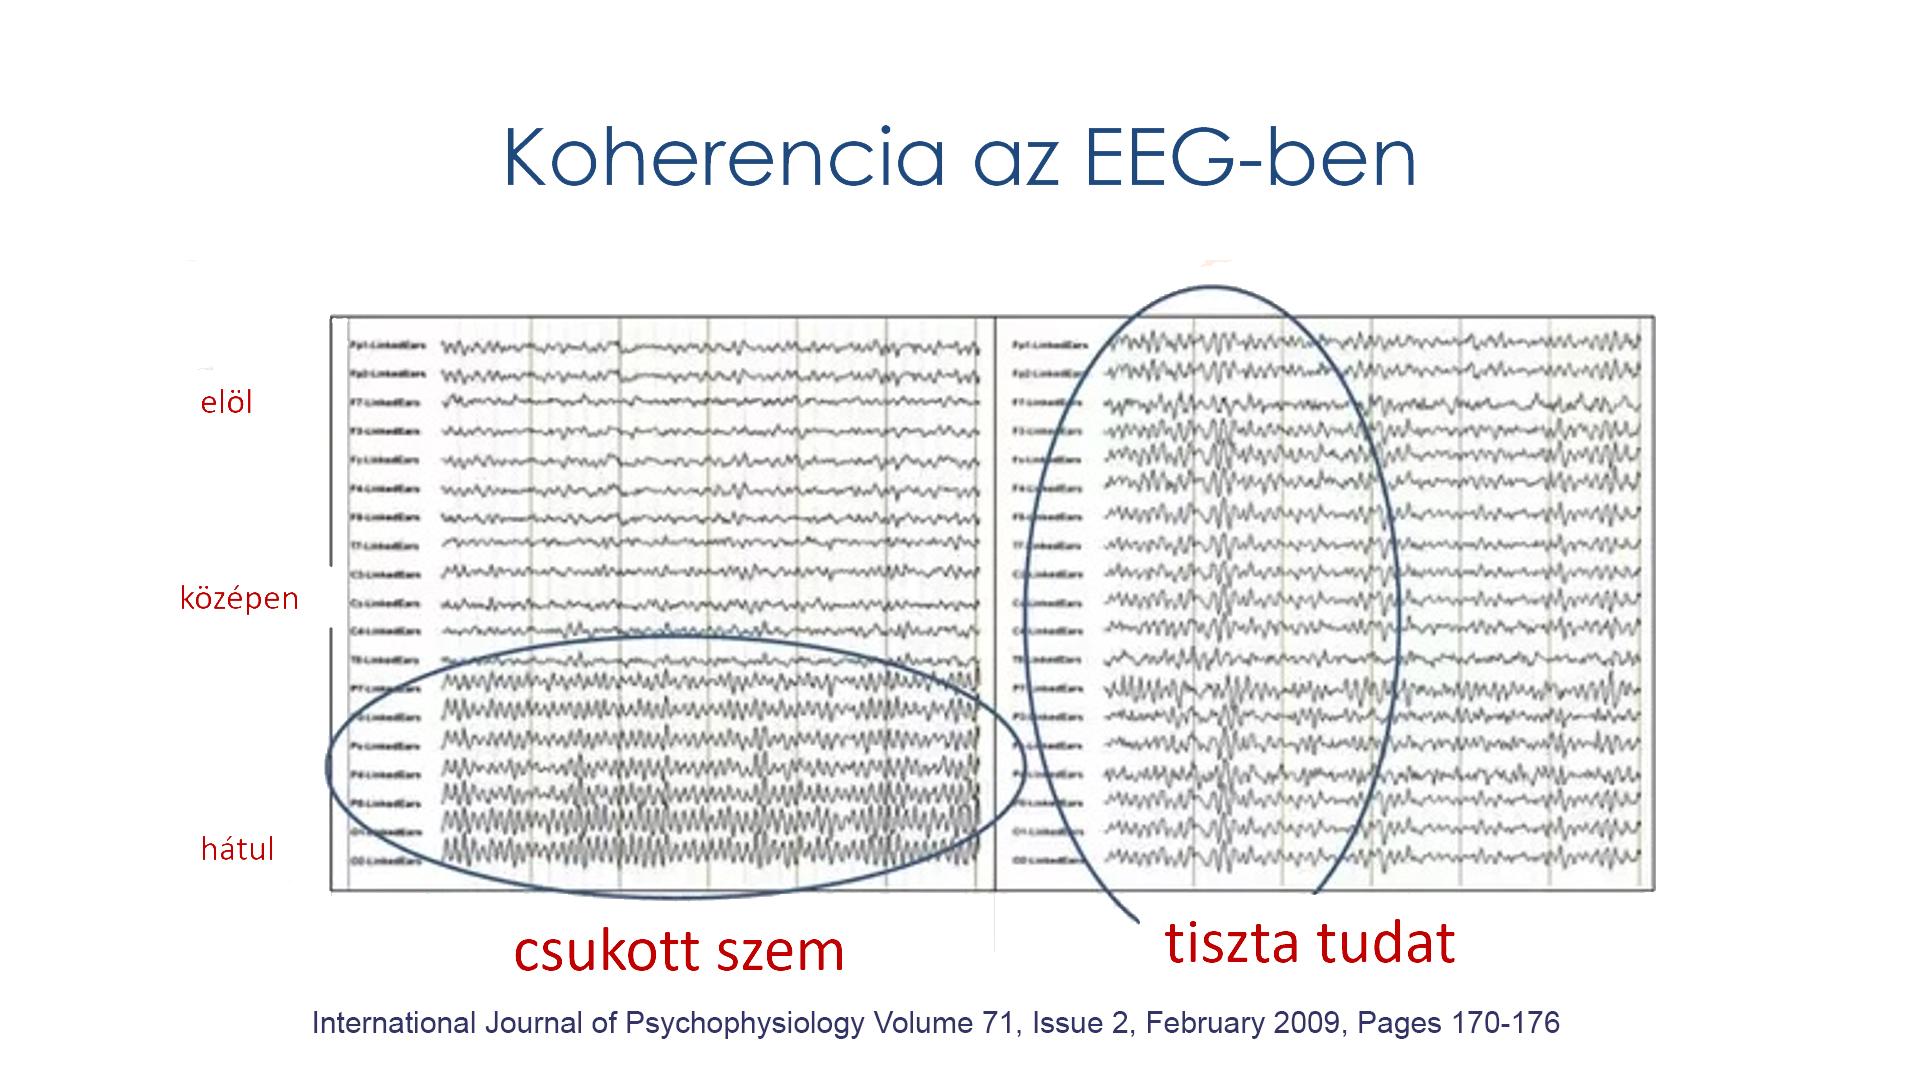 Koherencia az EEG-ben